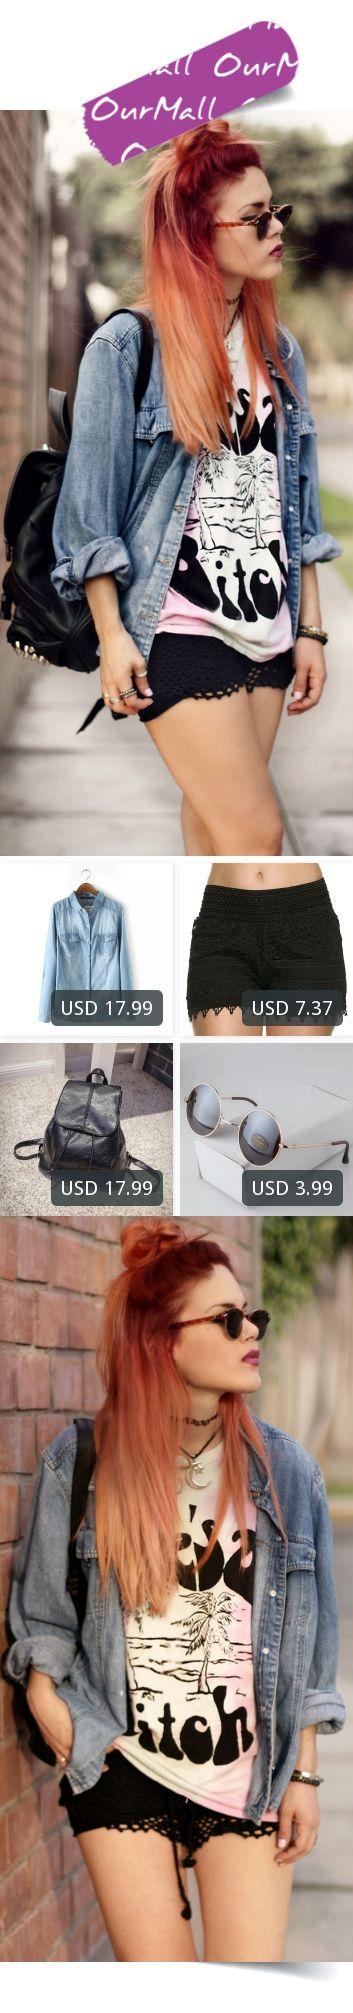 This is Lua P's buyer show in OurMall;  1.2016 Women's Jean Shirts European Style Denim Blouses Women Full Sleeve Turn-down Collar 2.Hot Fashion Solid Black White Summer Shorts Casual Lace Crochet Women Elastic Waist Hollow Shorts For Women 3.Brand Fashion Women PU Lea... please click the picture for detail. http://ourmall.com/?rU7rAn #coat #windbreaker #denimcoat #springcoat #girlscoat #coatforwomen #femalecoat #trenchcoat #capecoat #rackcoat #womencoat